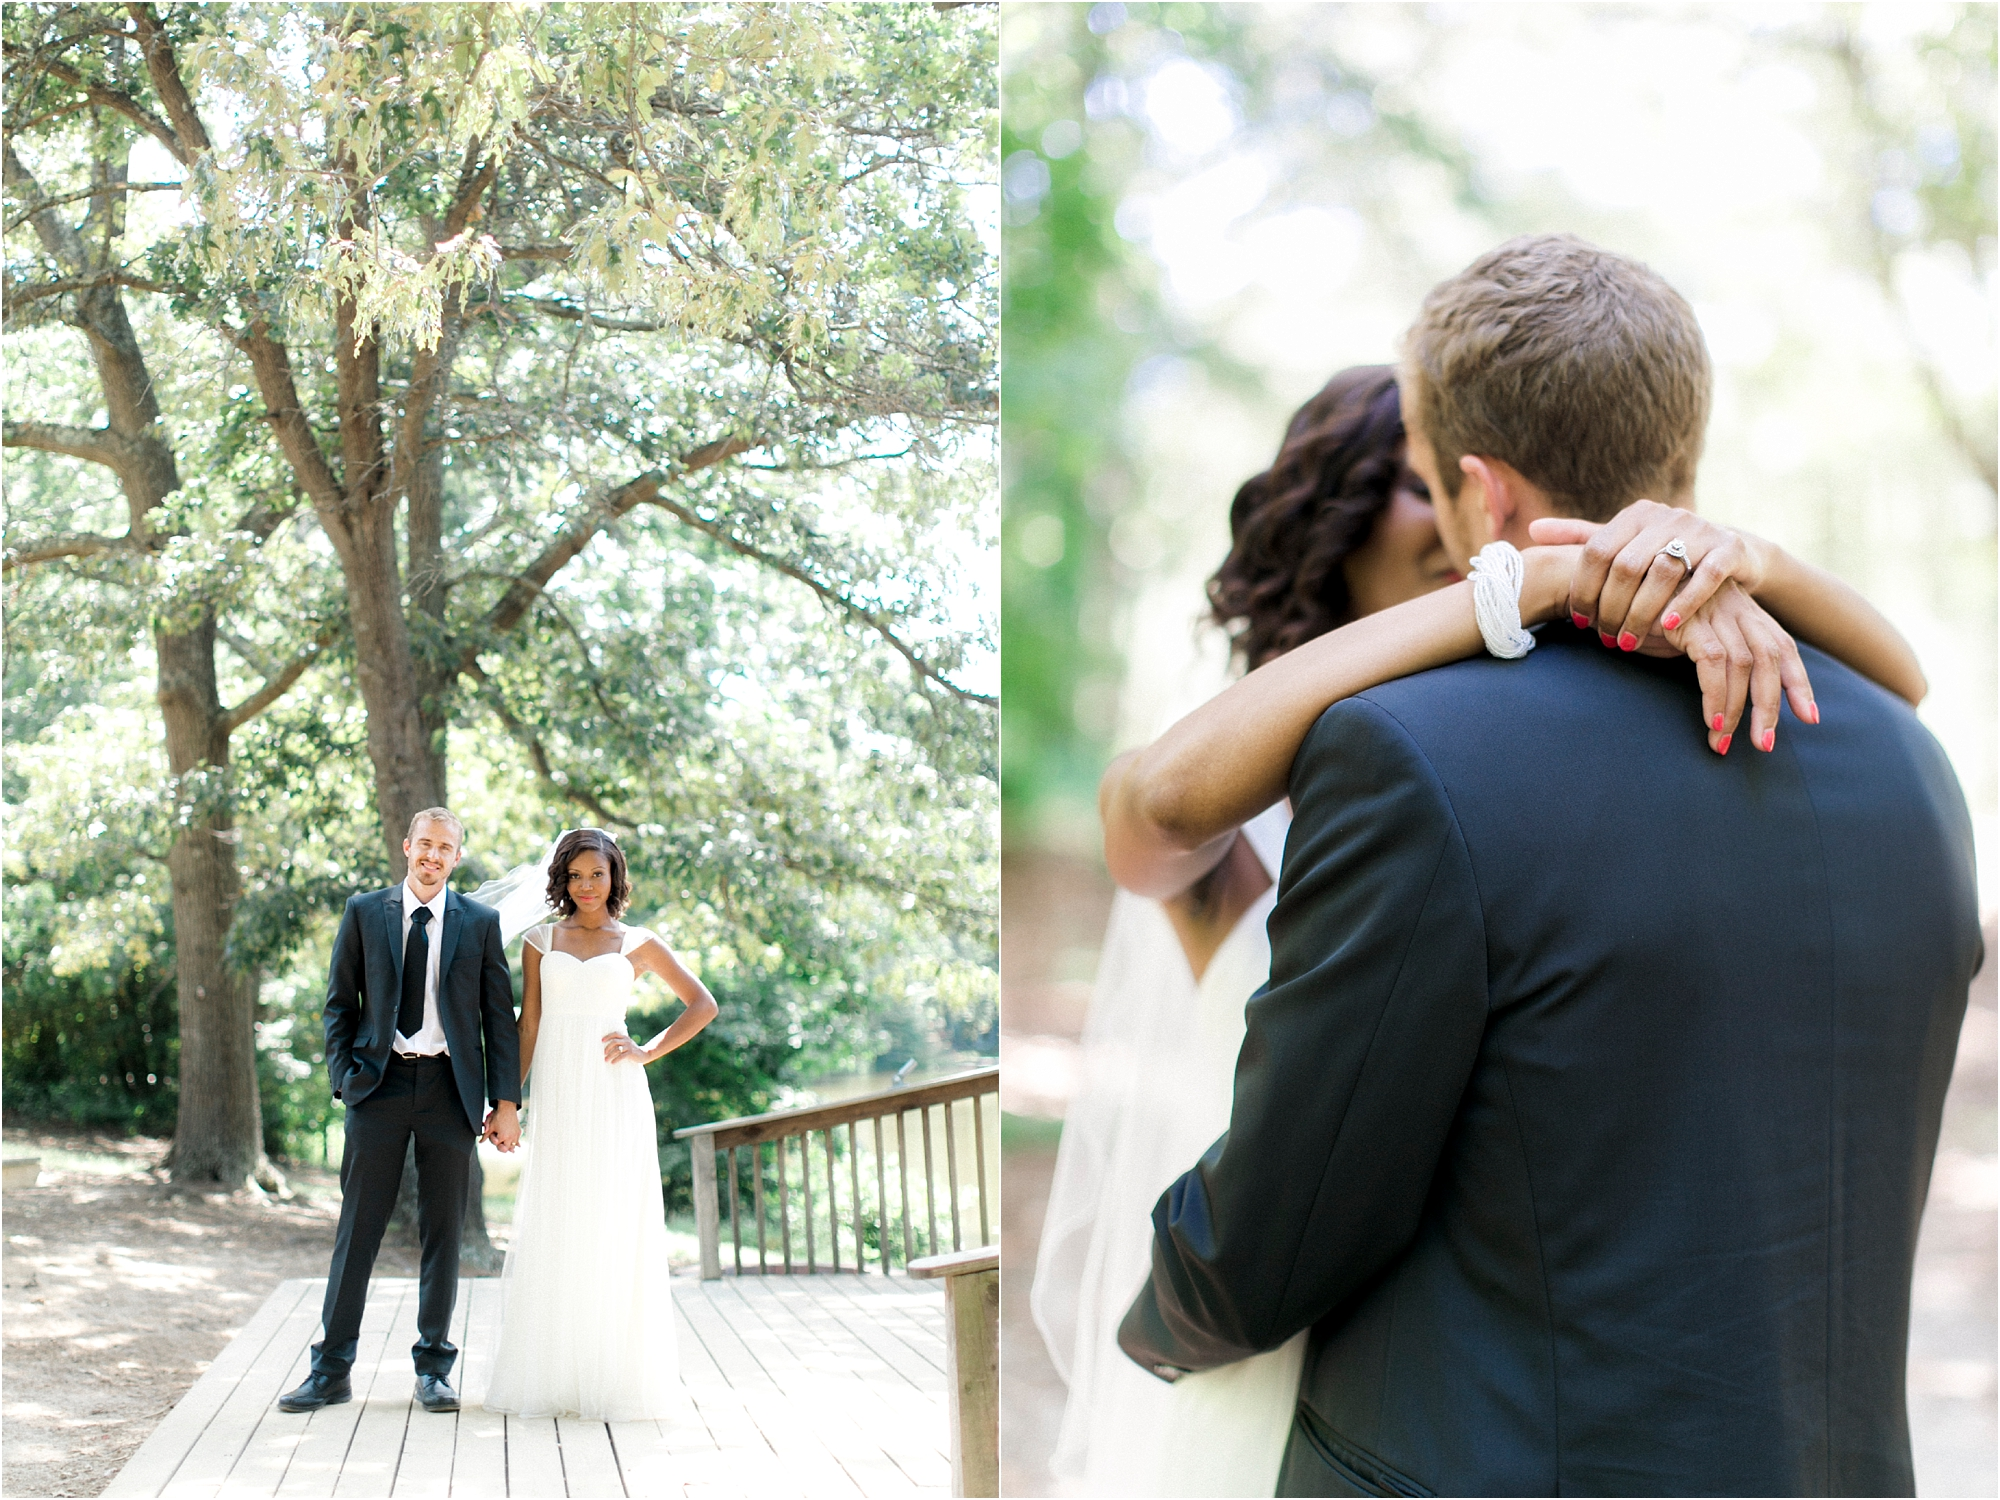 inimate-richmond-virginia-backyard-summer-wedding-photos_0023.jpg